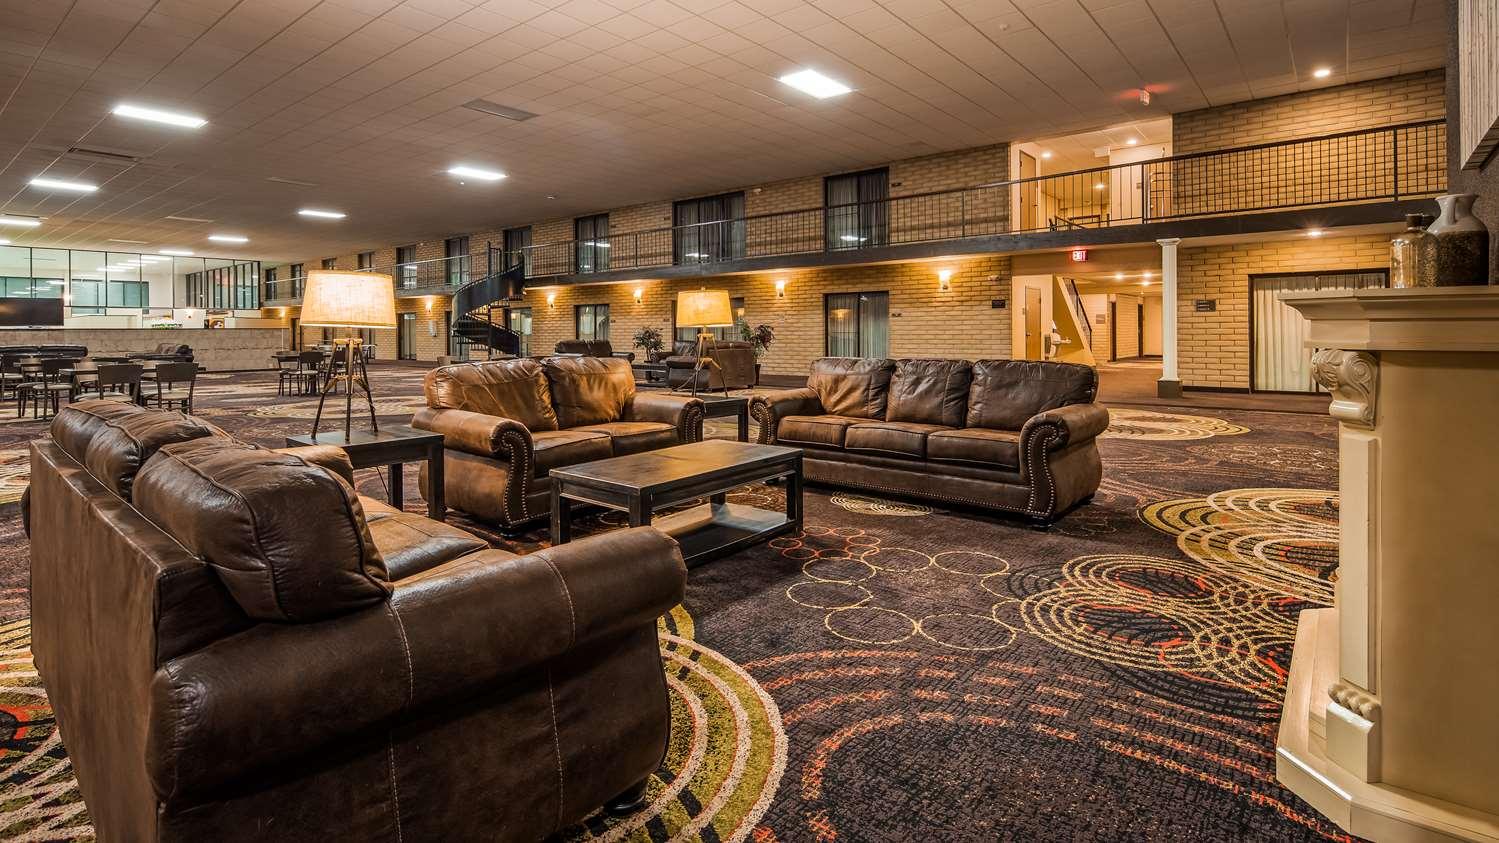 proam - Best Western Wichita North Hotel